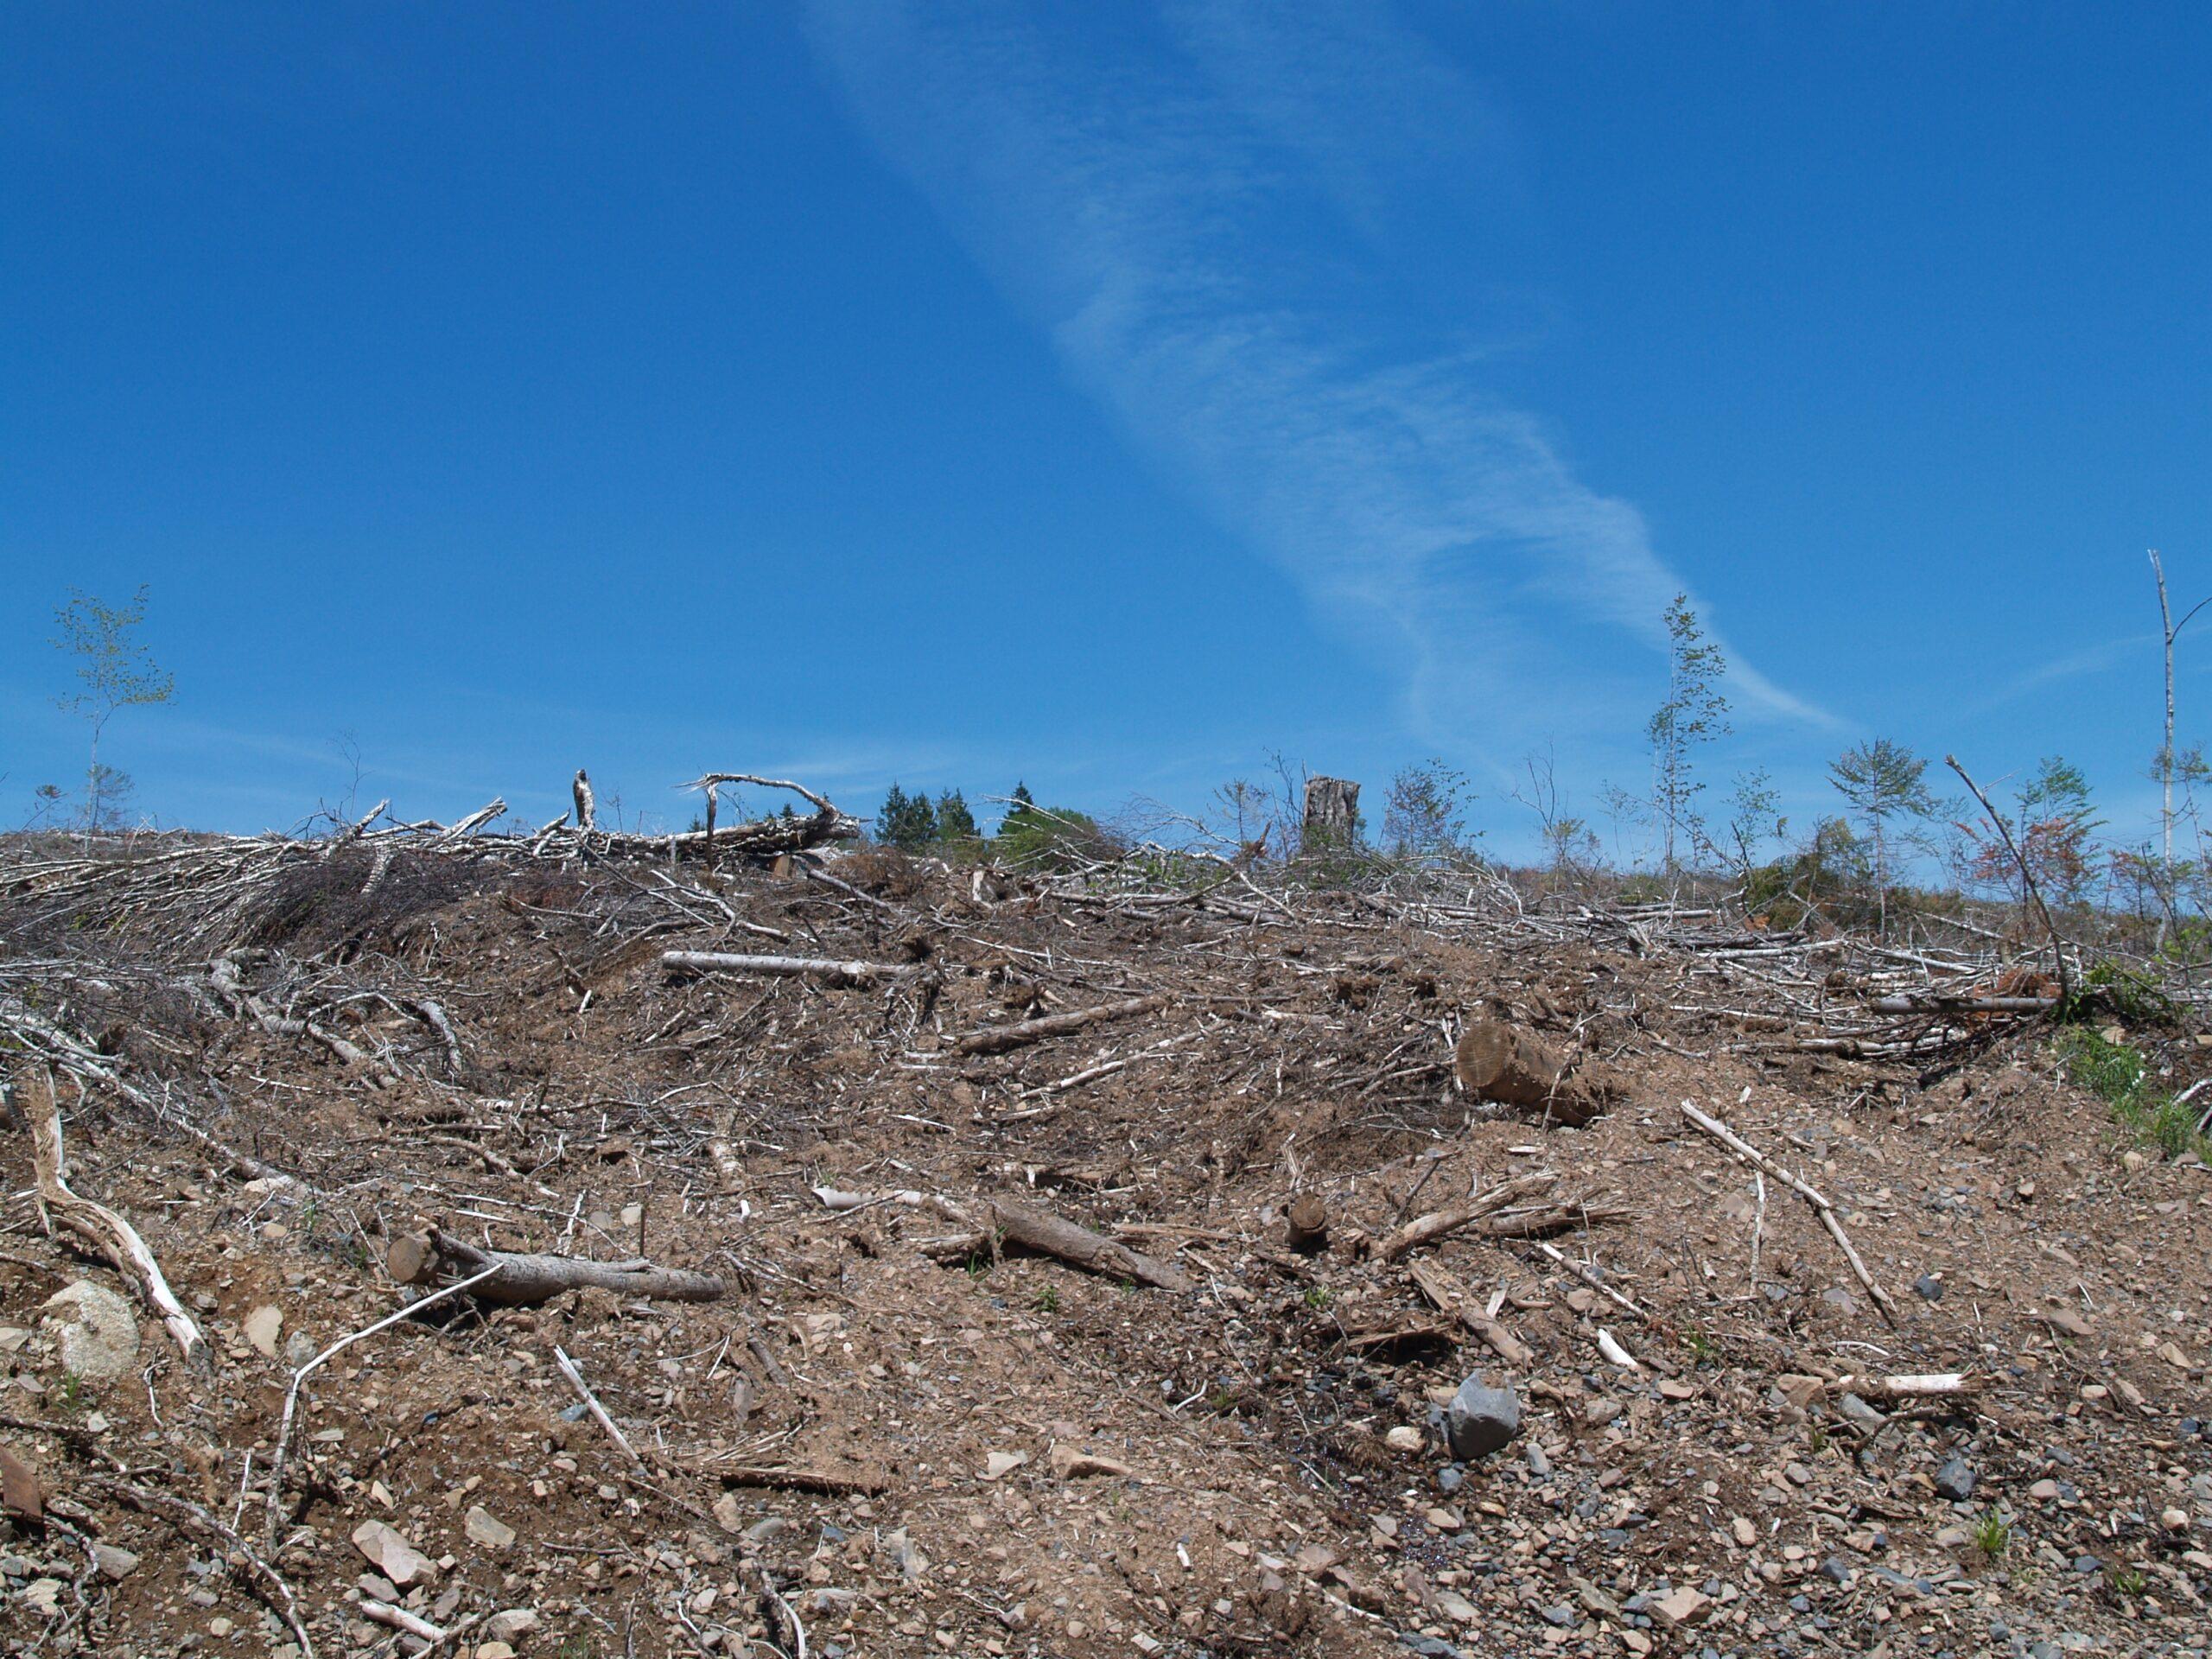 Clearcut near Bass River, Nova Scotia. Photo: Joan Baxter